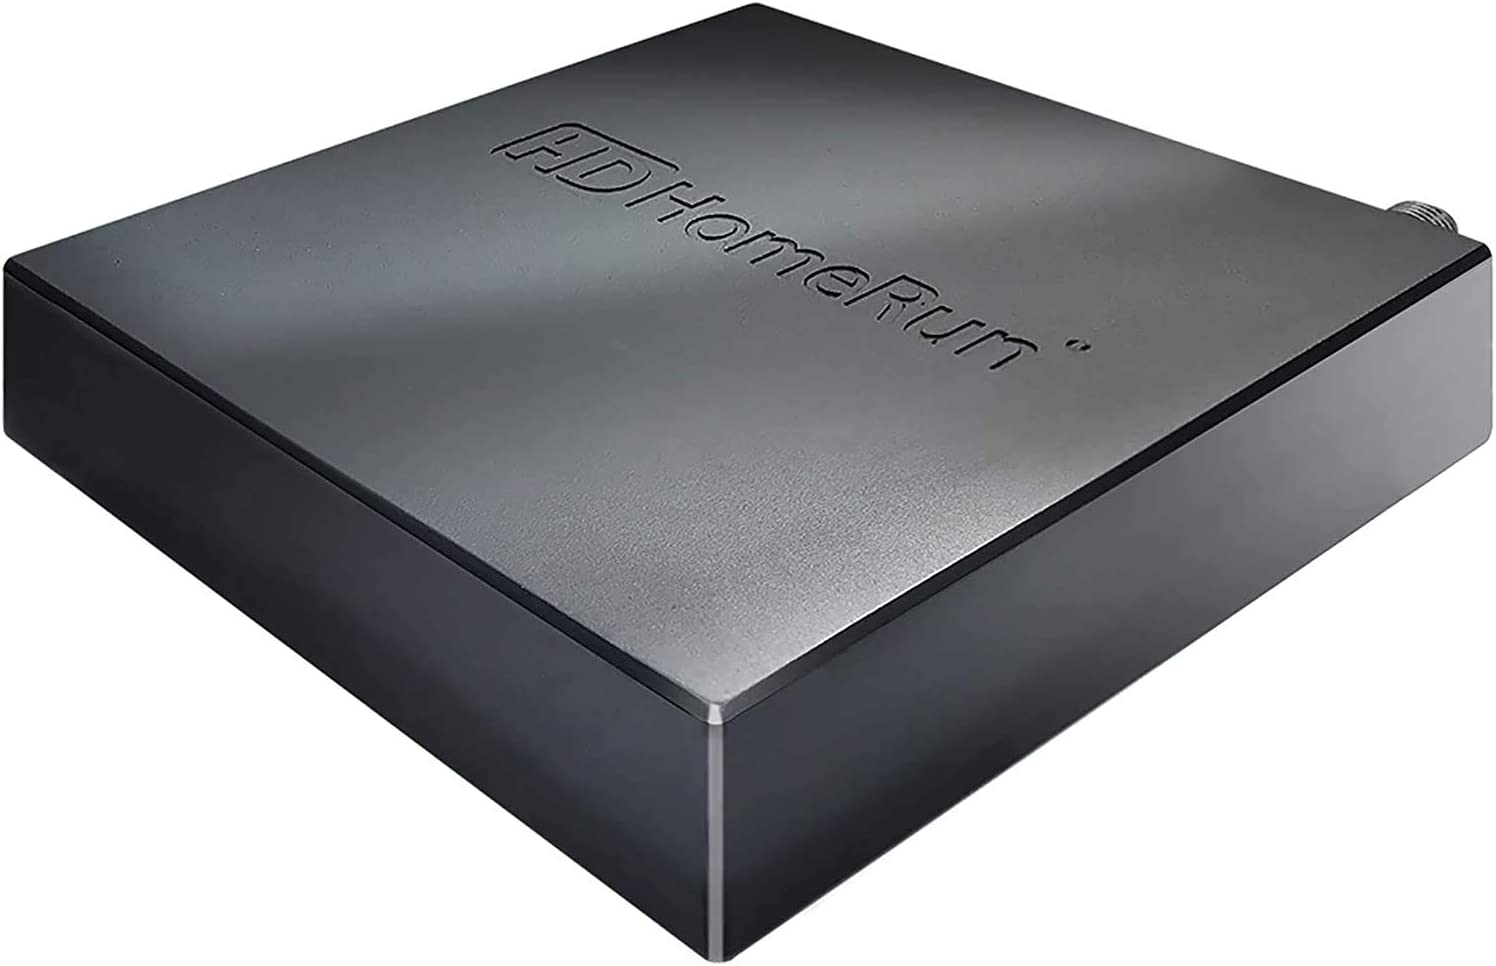 Silicondust HDHomeRun Scribe 4K OTA DVR Recorder (HDVR-4K-1TB)